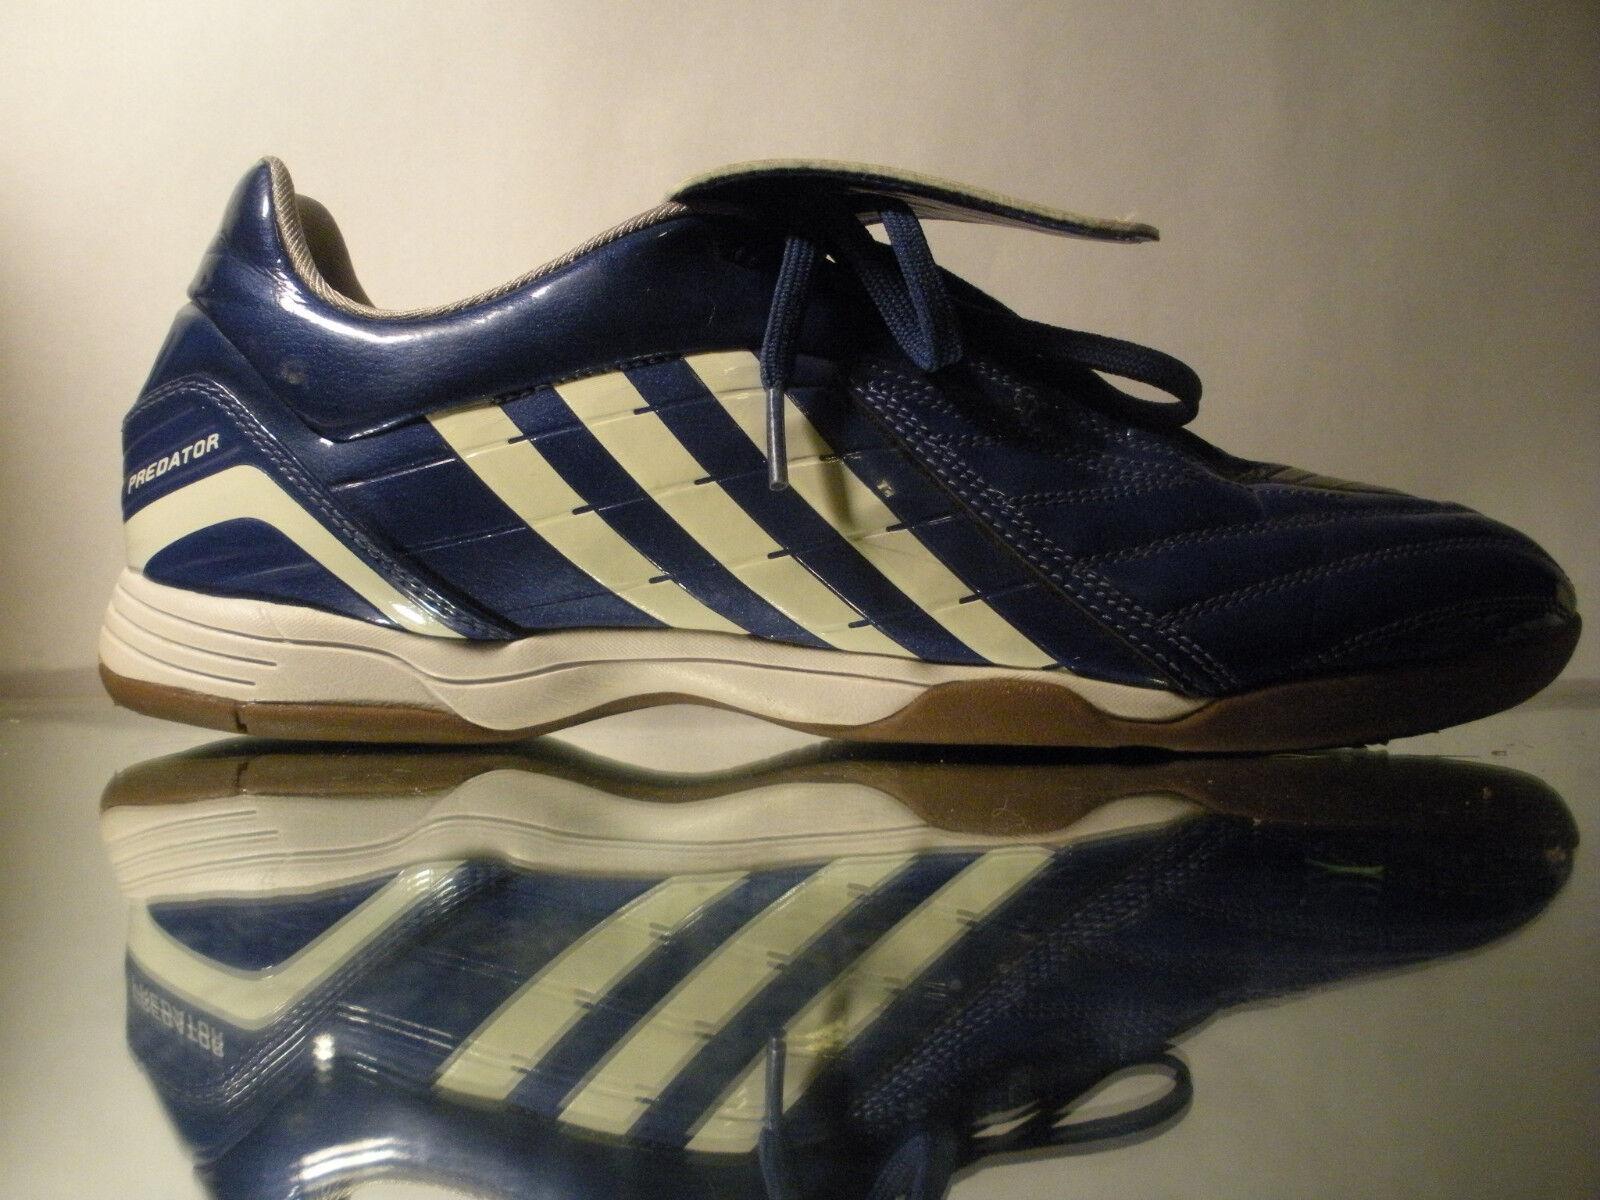 39c6921dd6a ... Adidas Predator Powerswerve Absolado Indoor Soccer Soccer Soccer Flat  shoes blueee White Sz 11.5 c9806f ...